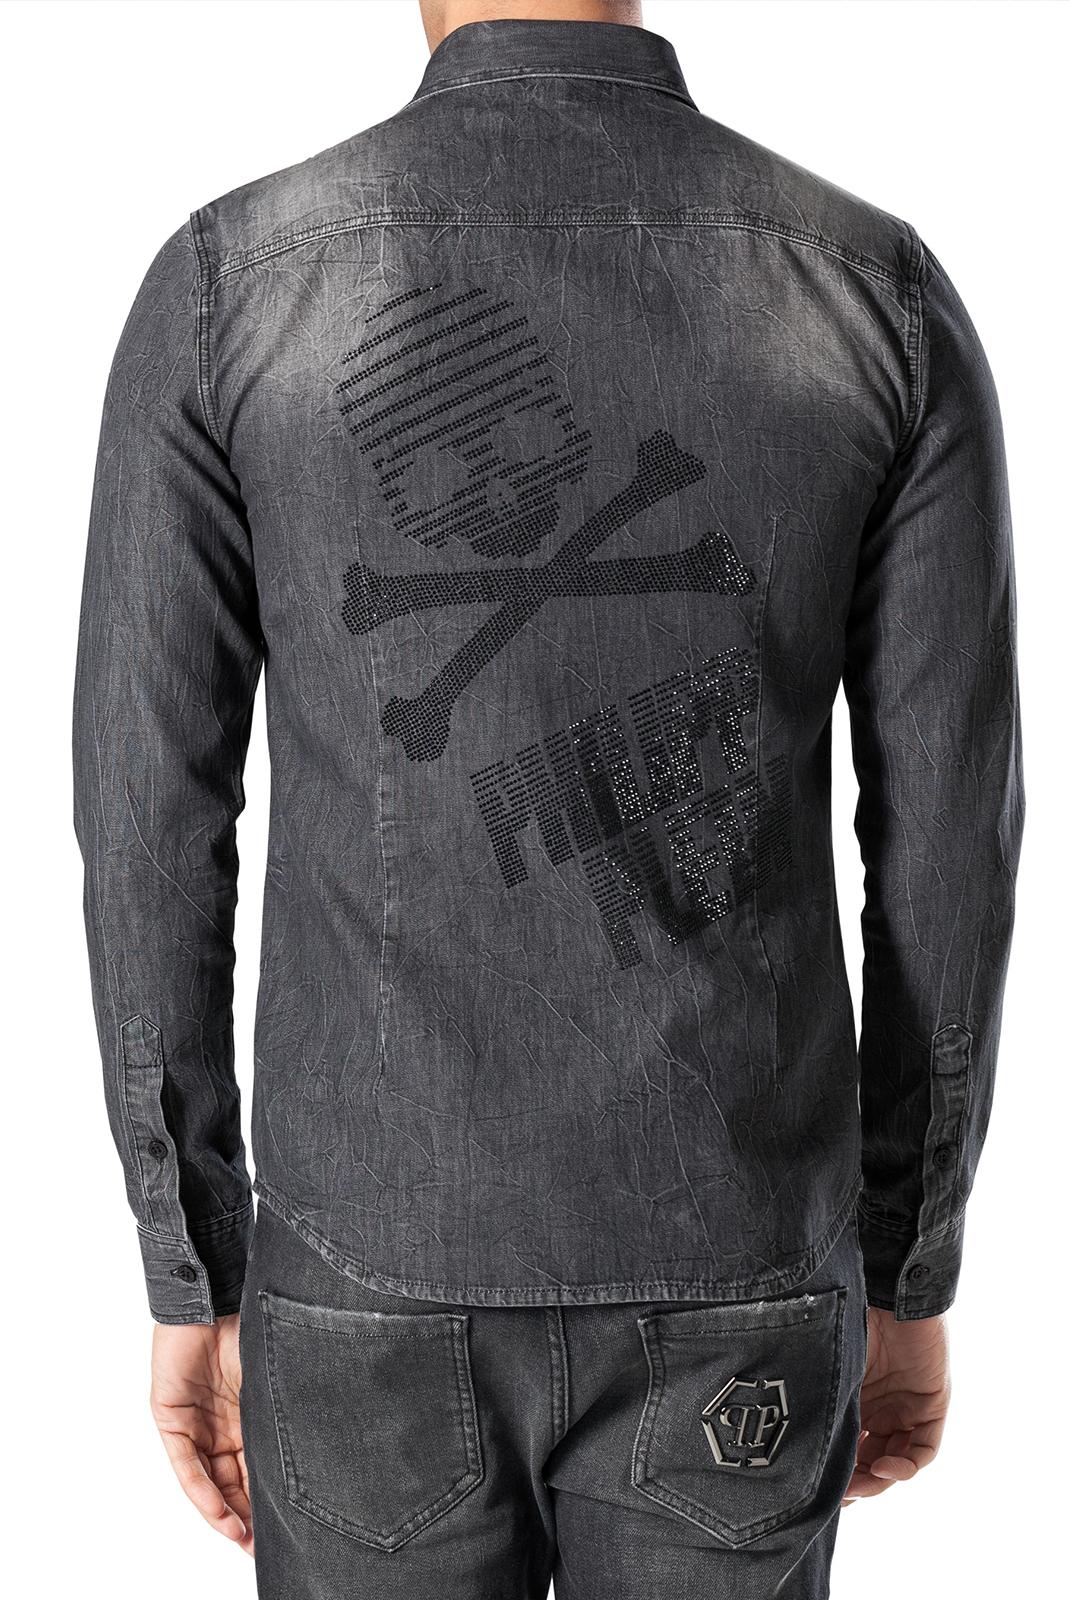 Chemises manches longues  Philipp plein MDP0036 FULL GRIS FONCE